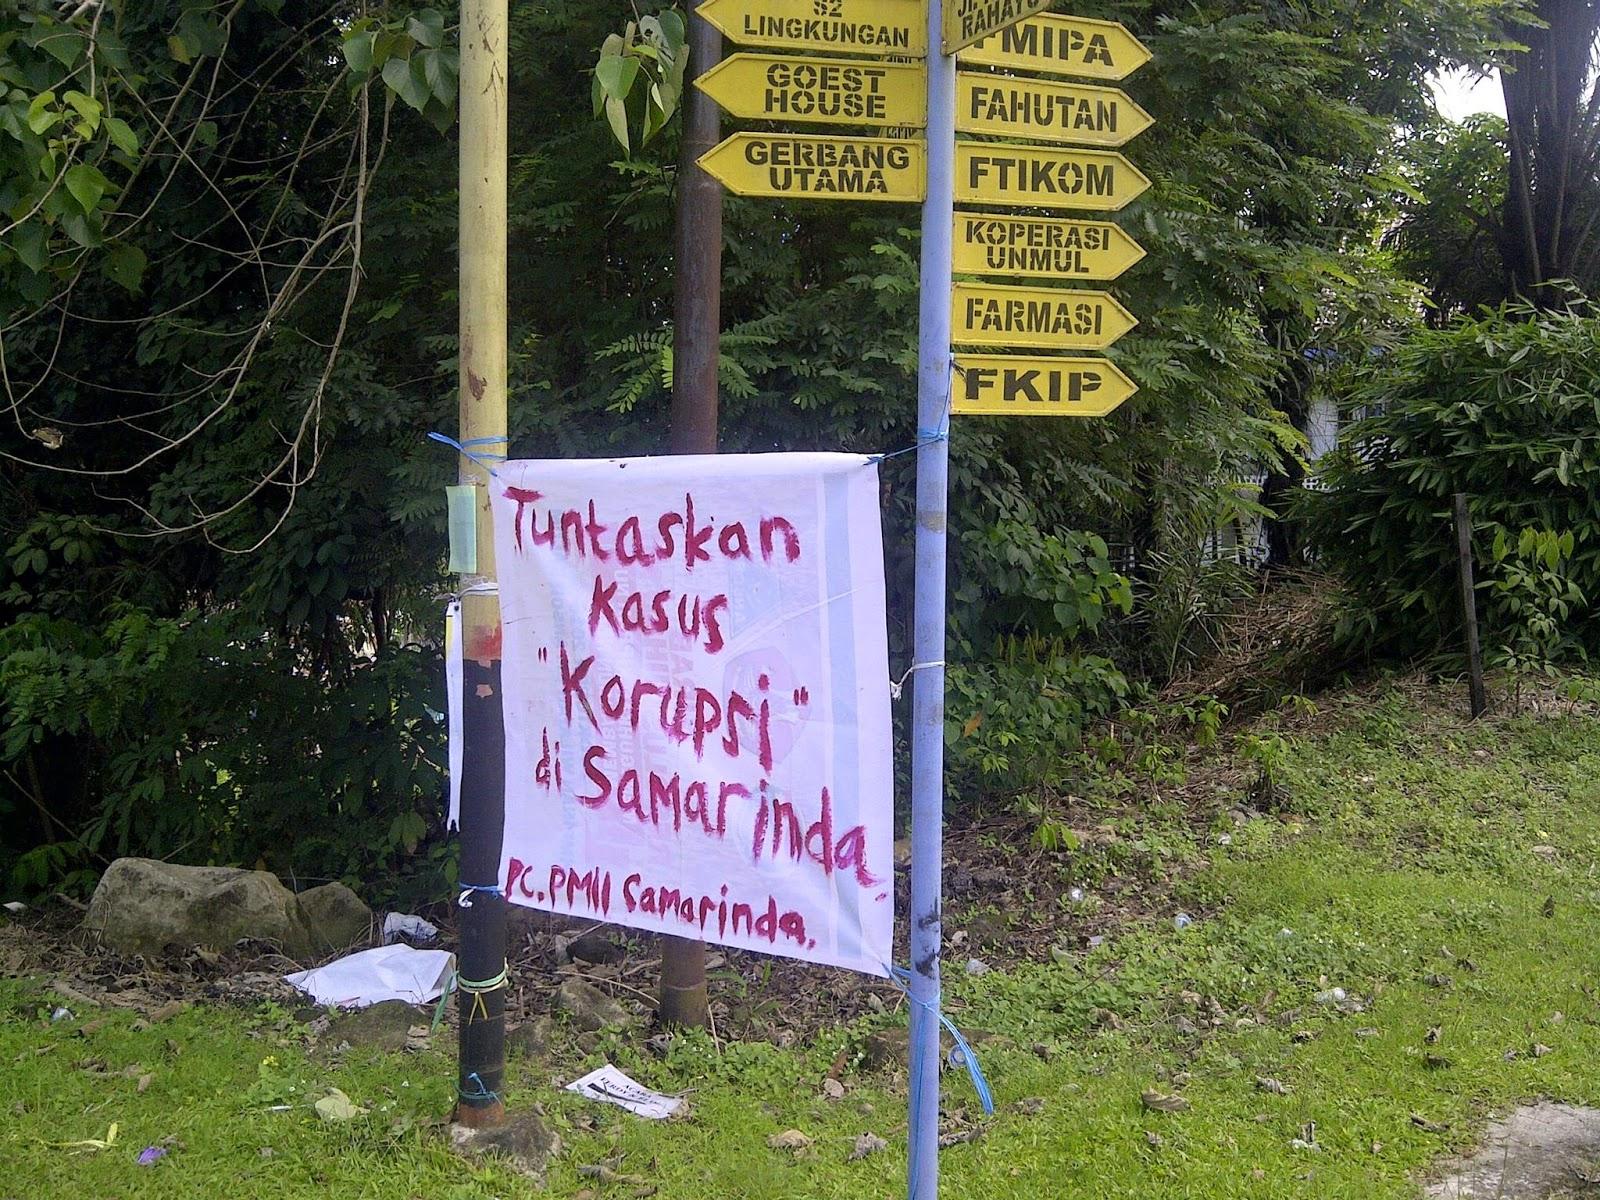 Pc Pmii Kota Samarinda Tegas Mengawal Kasus Sampai Tuntas 9